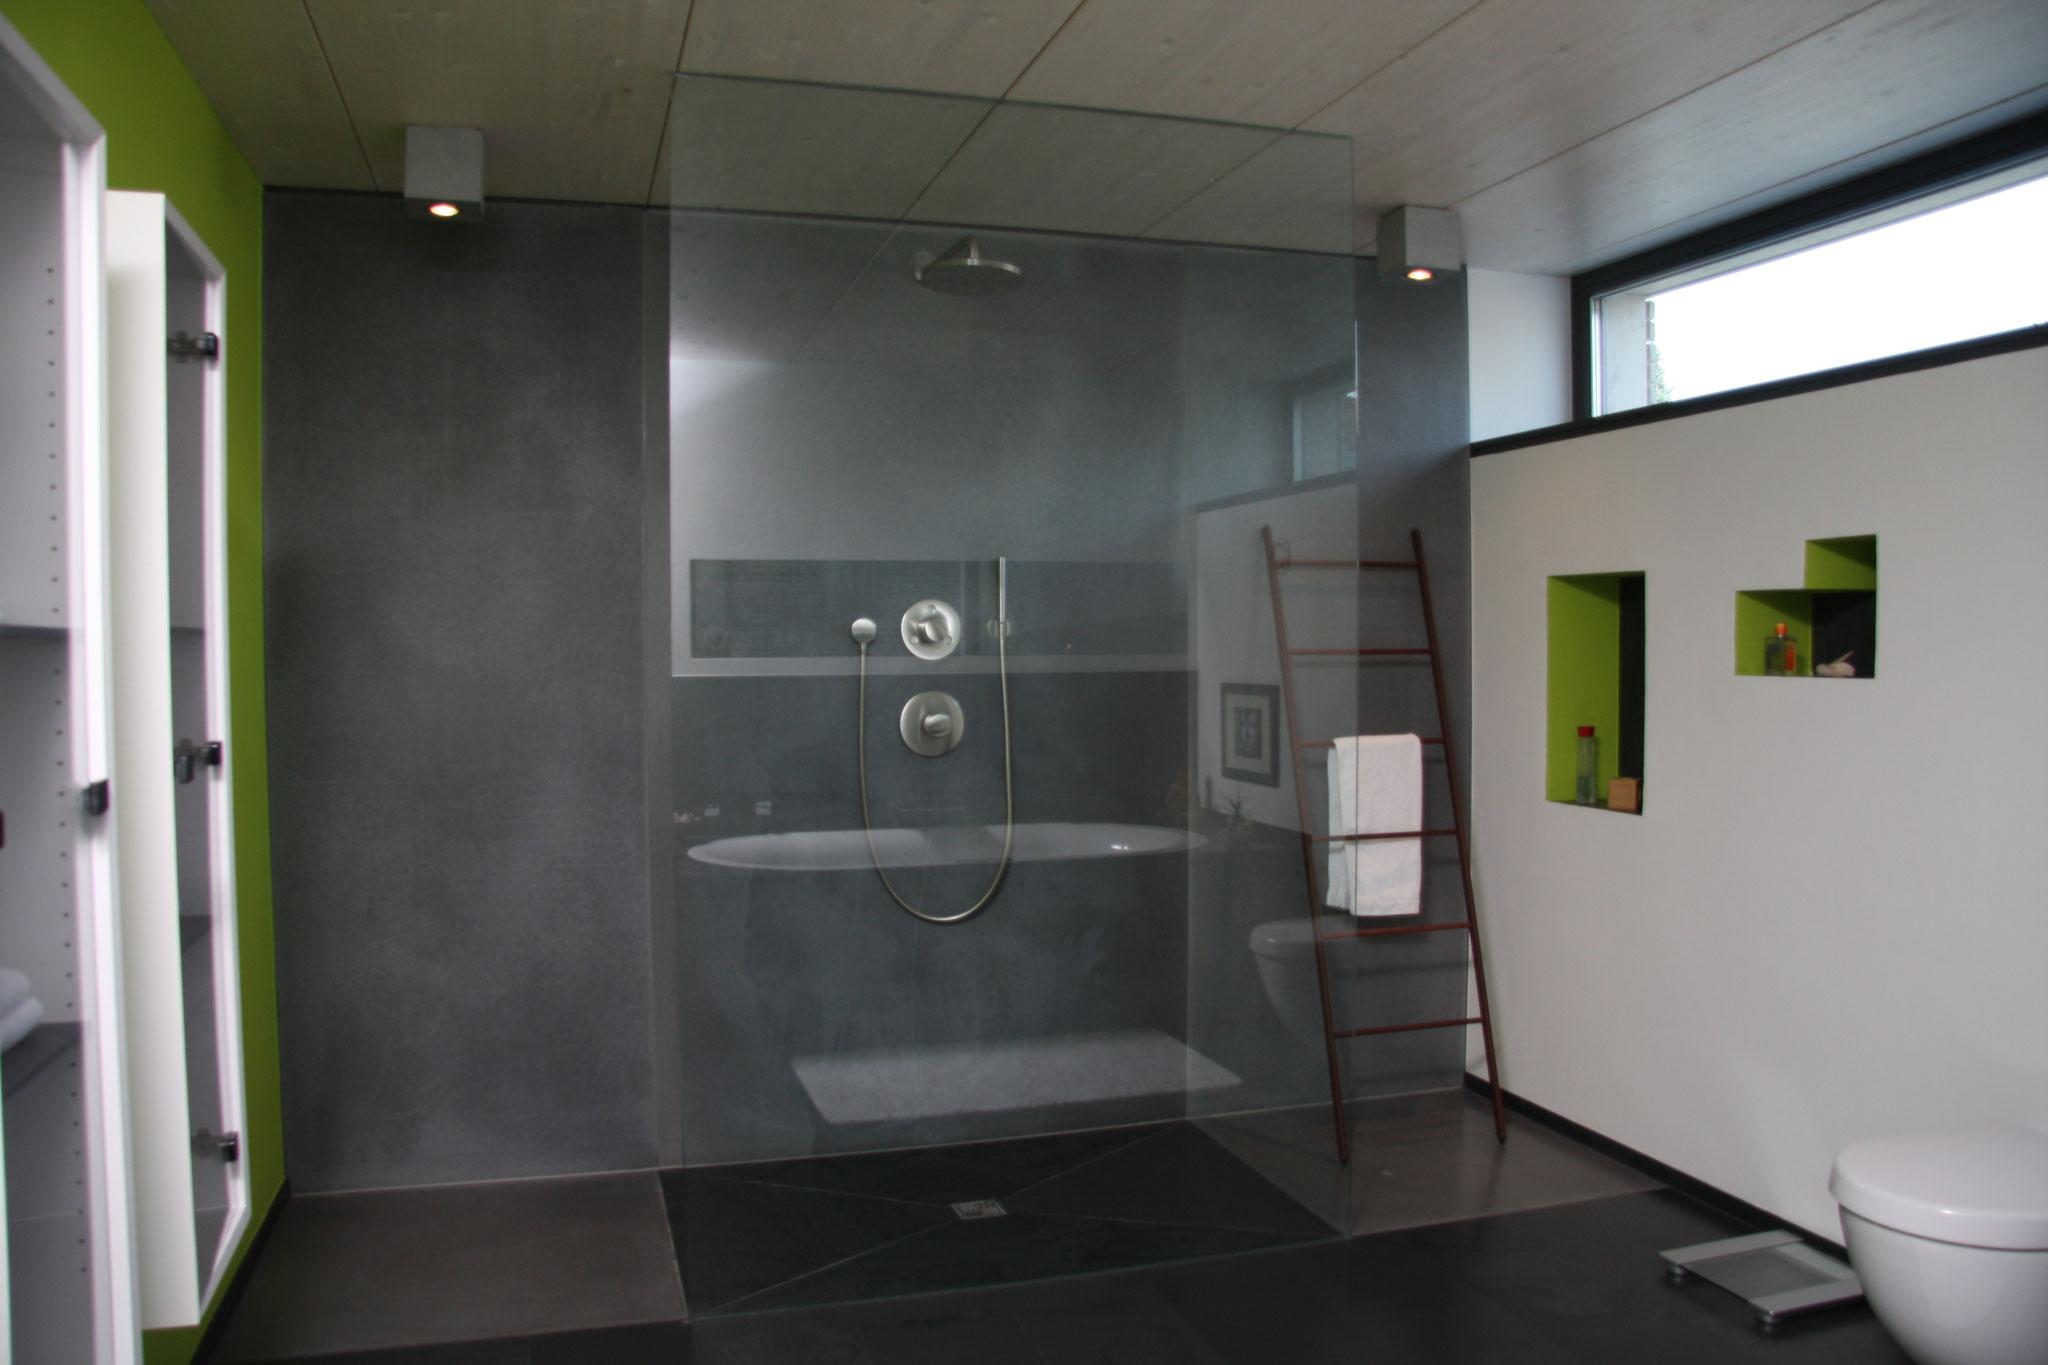 Design Beton Fußboden ~ Beton & raum design nonnast raum&beton design